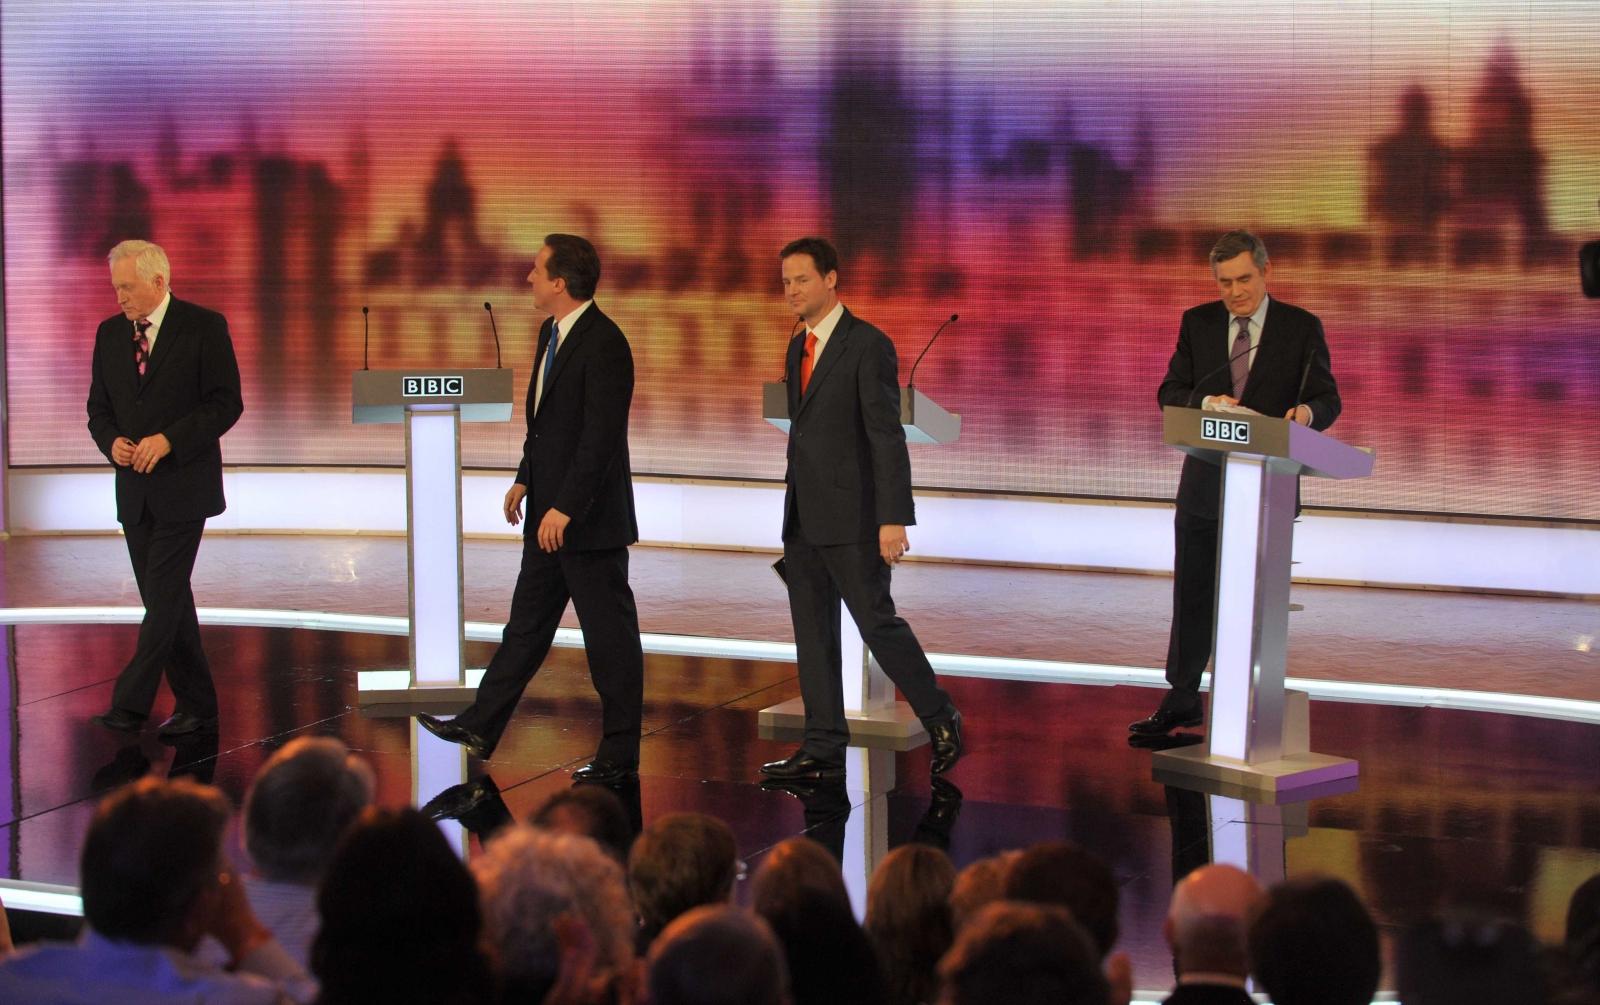 2010 TV debates